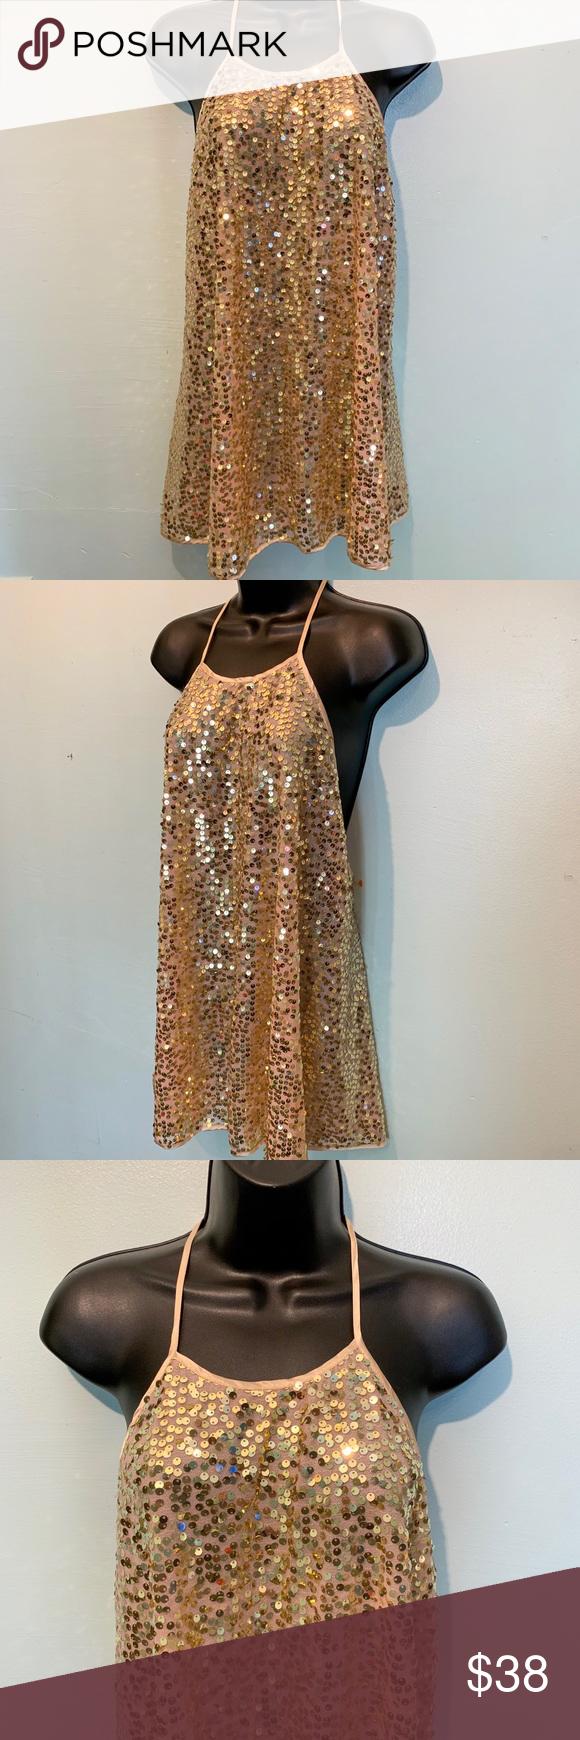 New Victoria S Secret Gold Sequin Dress Sequin Cocktail Dress Victoria Secret Dress Large Size Dresses [ 1740 x 580 Pixel ]